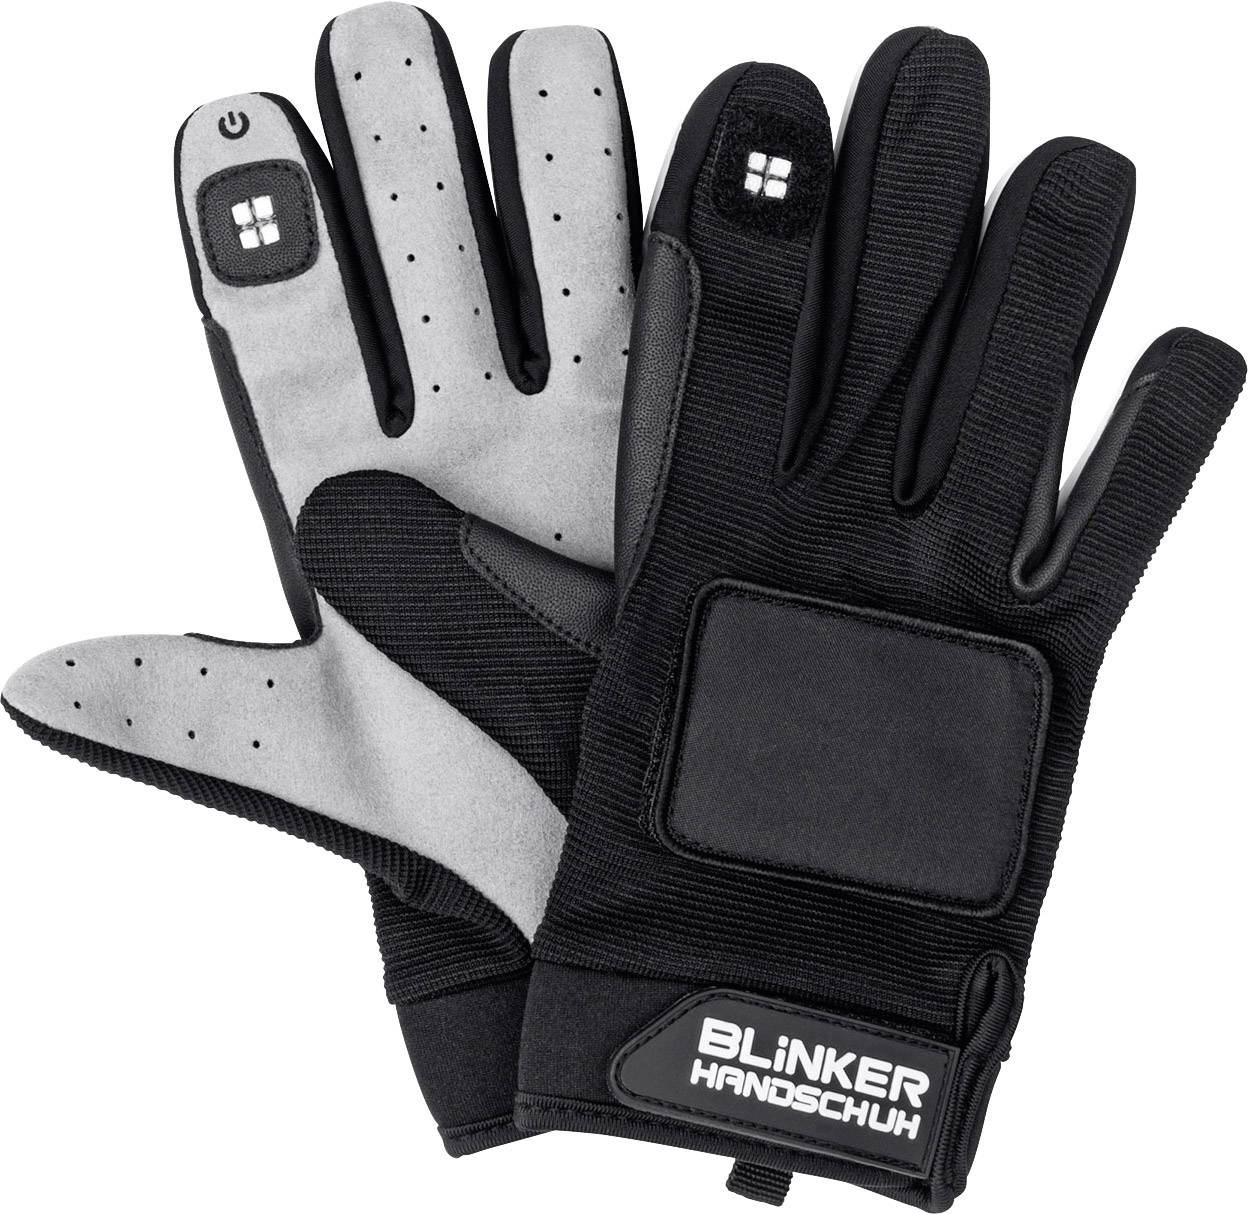 Rukavice a blinkrami Blinker Handschuh 0501, M/L, 1 pár